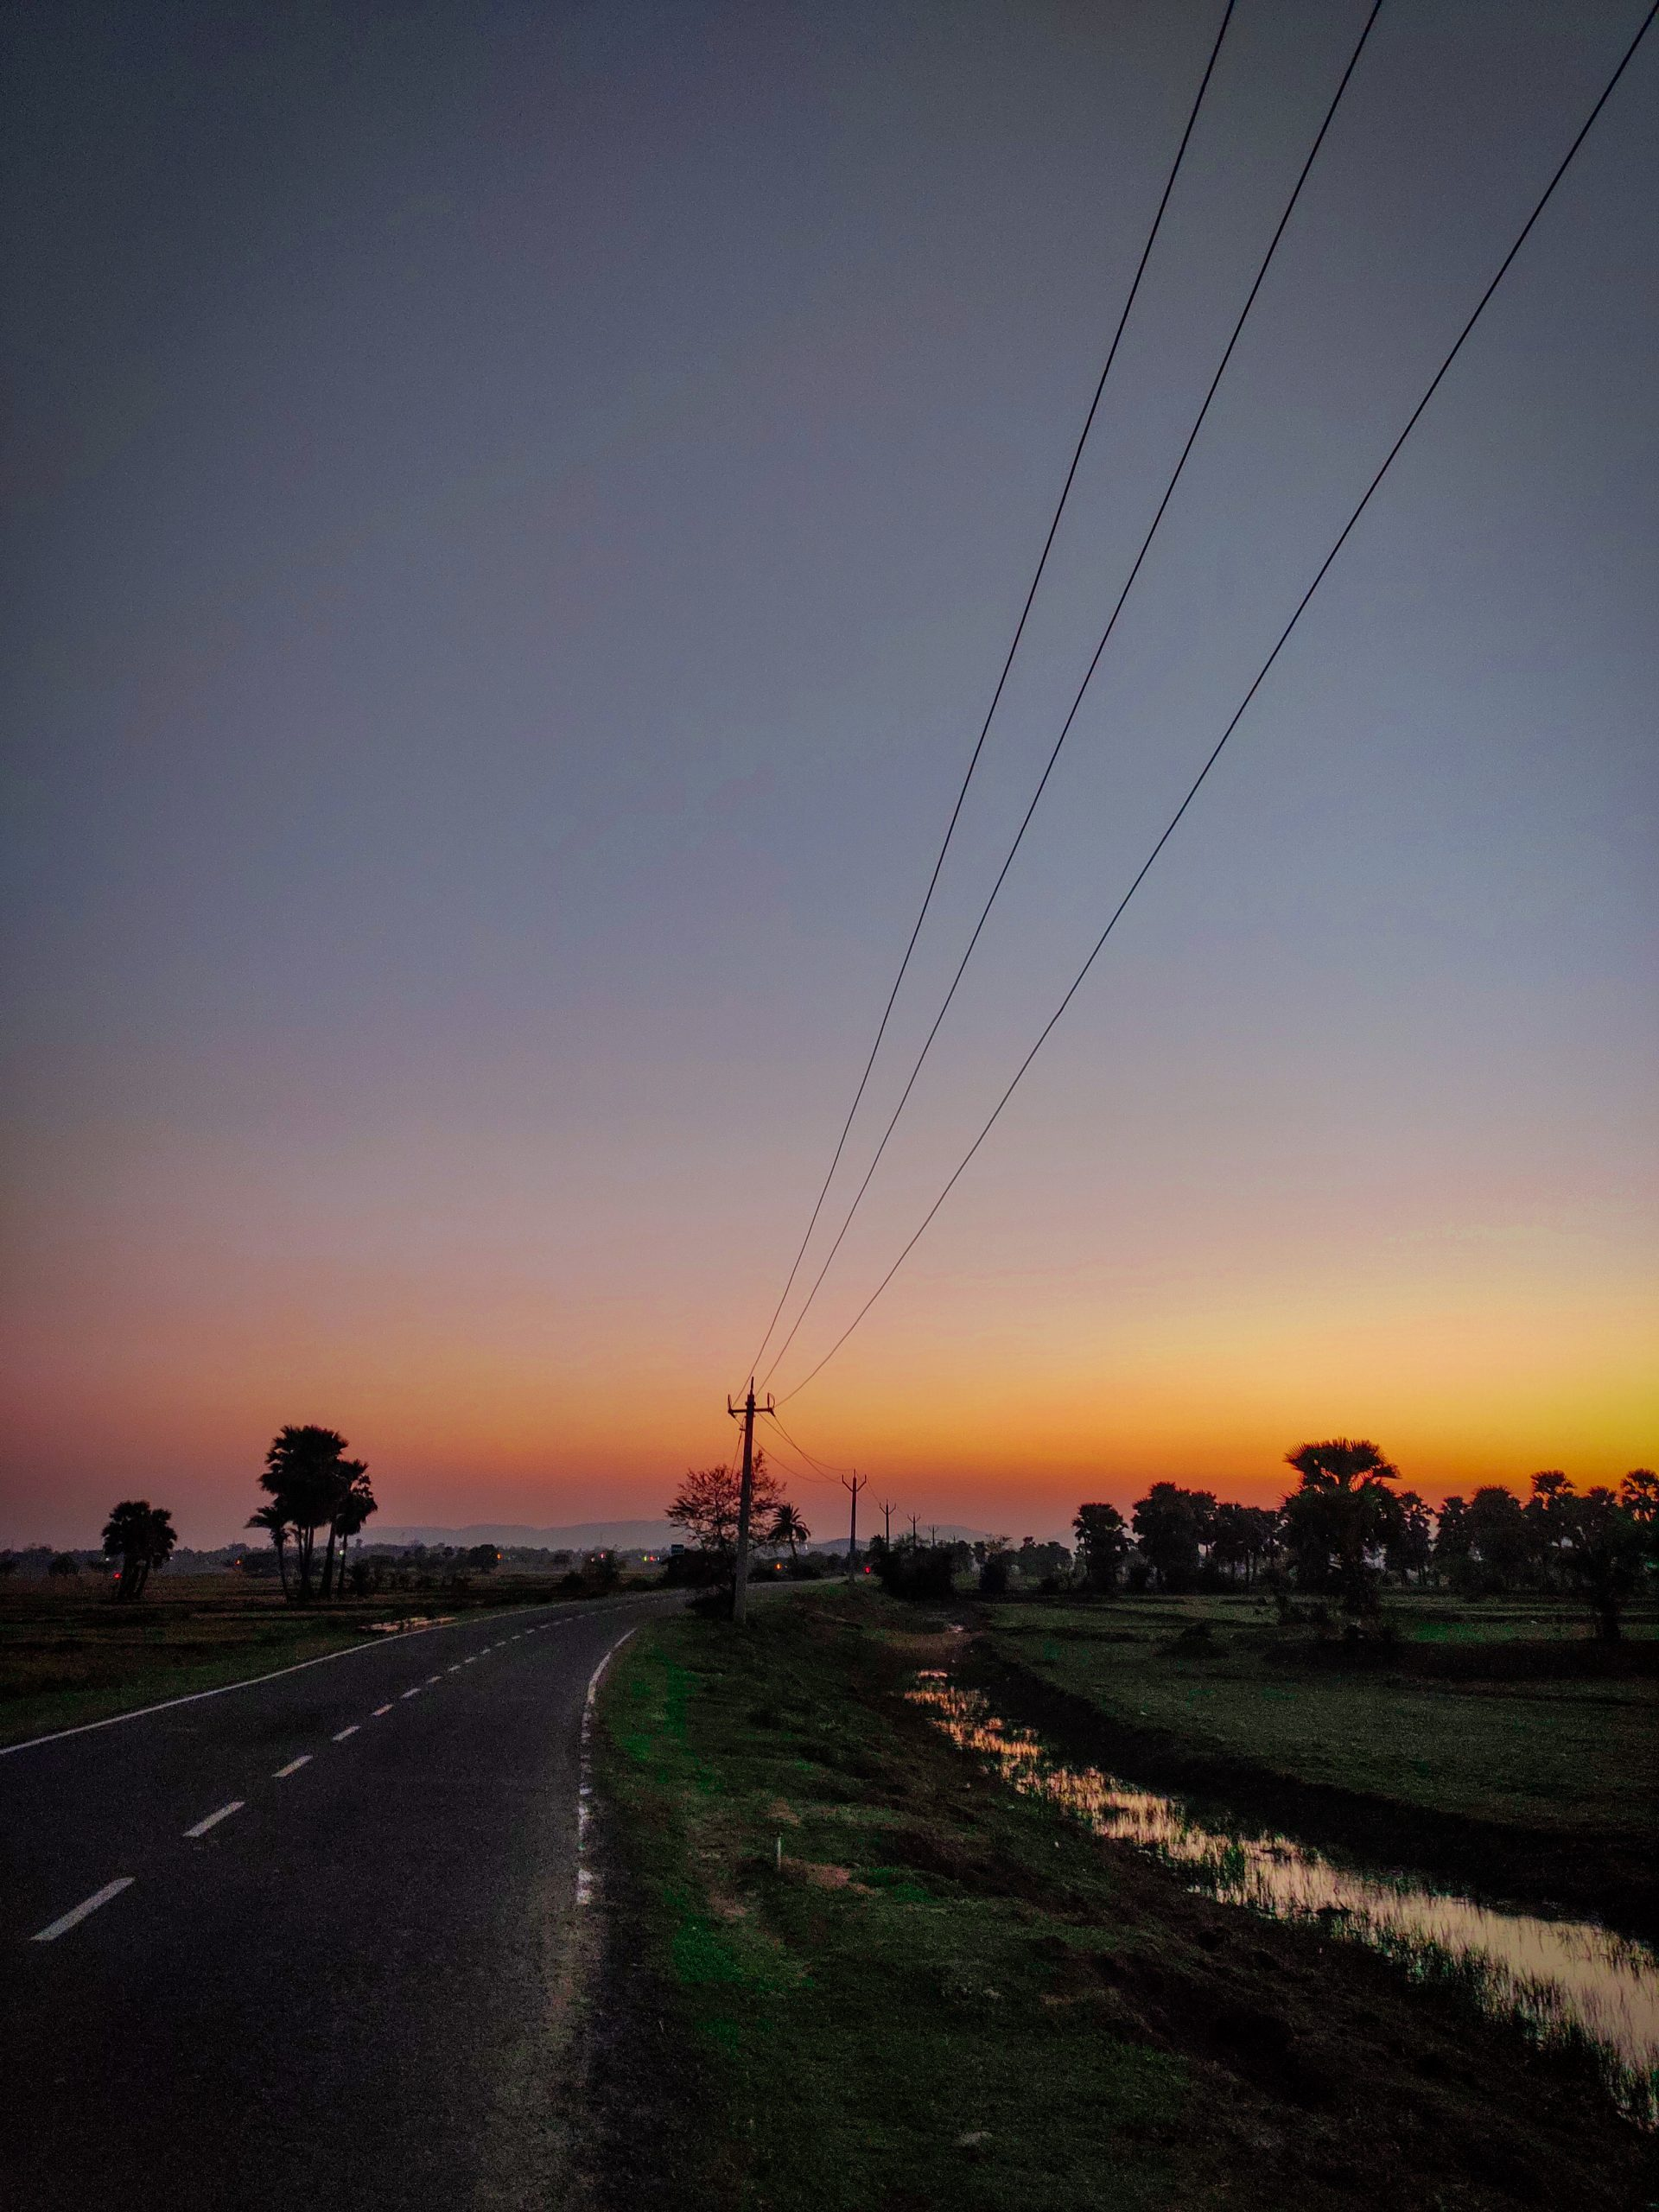 Scene after sunset